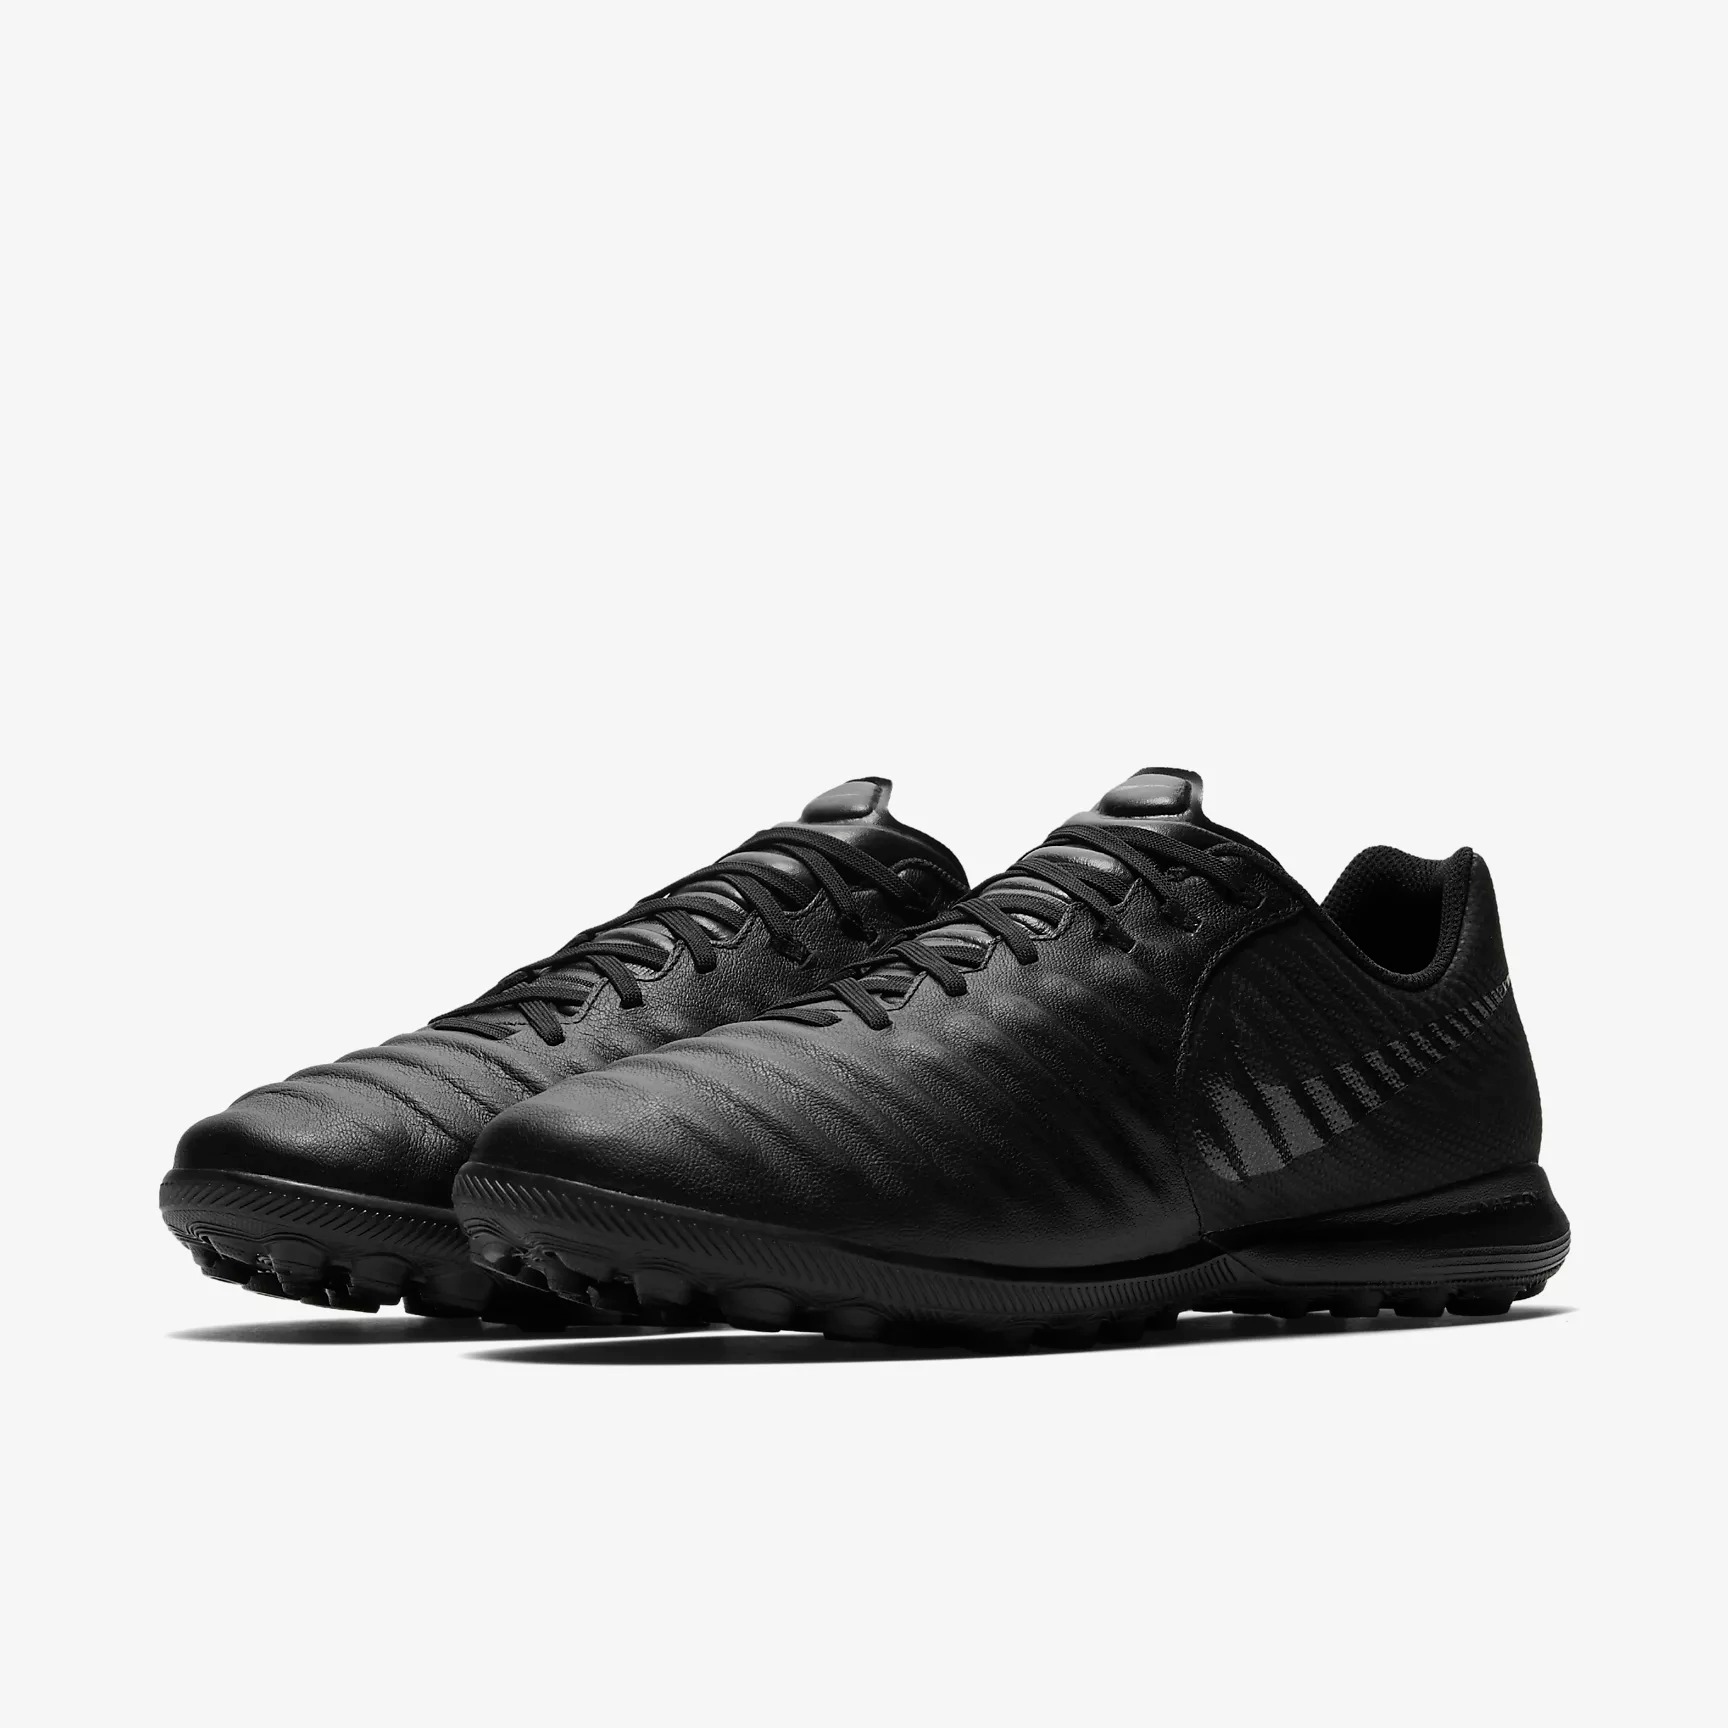 866a83527 Nike TiempoX Lunar Legend VII Pro TF Soccer Shoes - Soccer Cleats Nike  Football Boots - Superfanas.lt